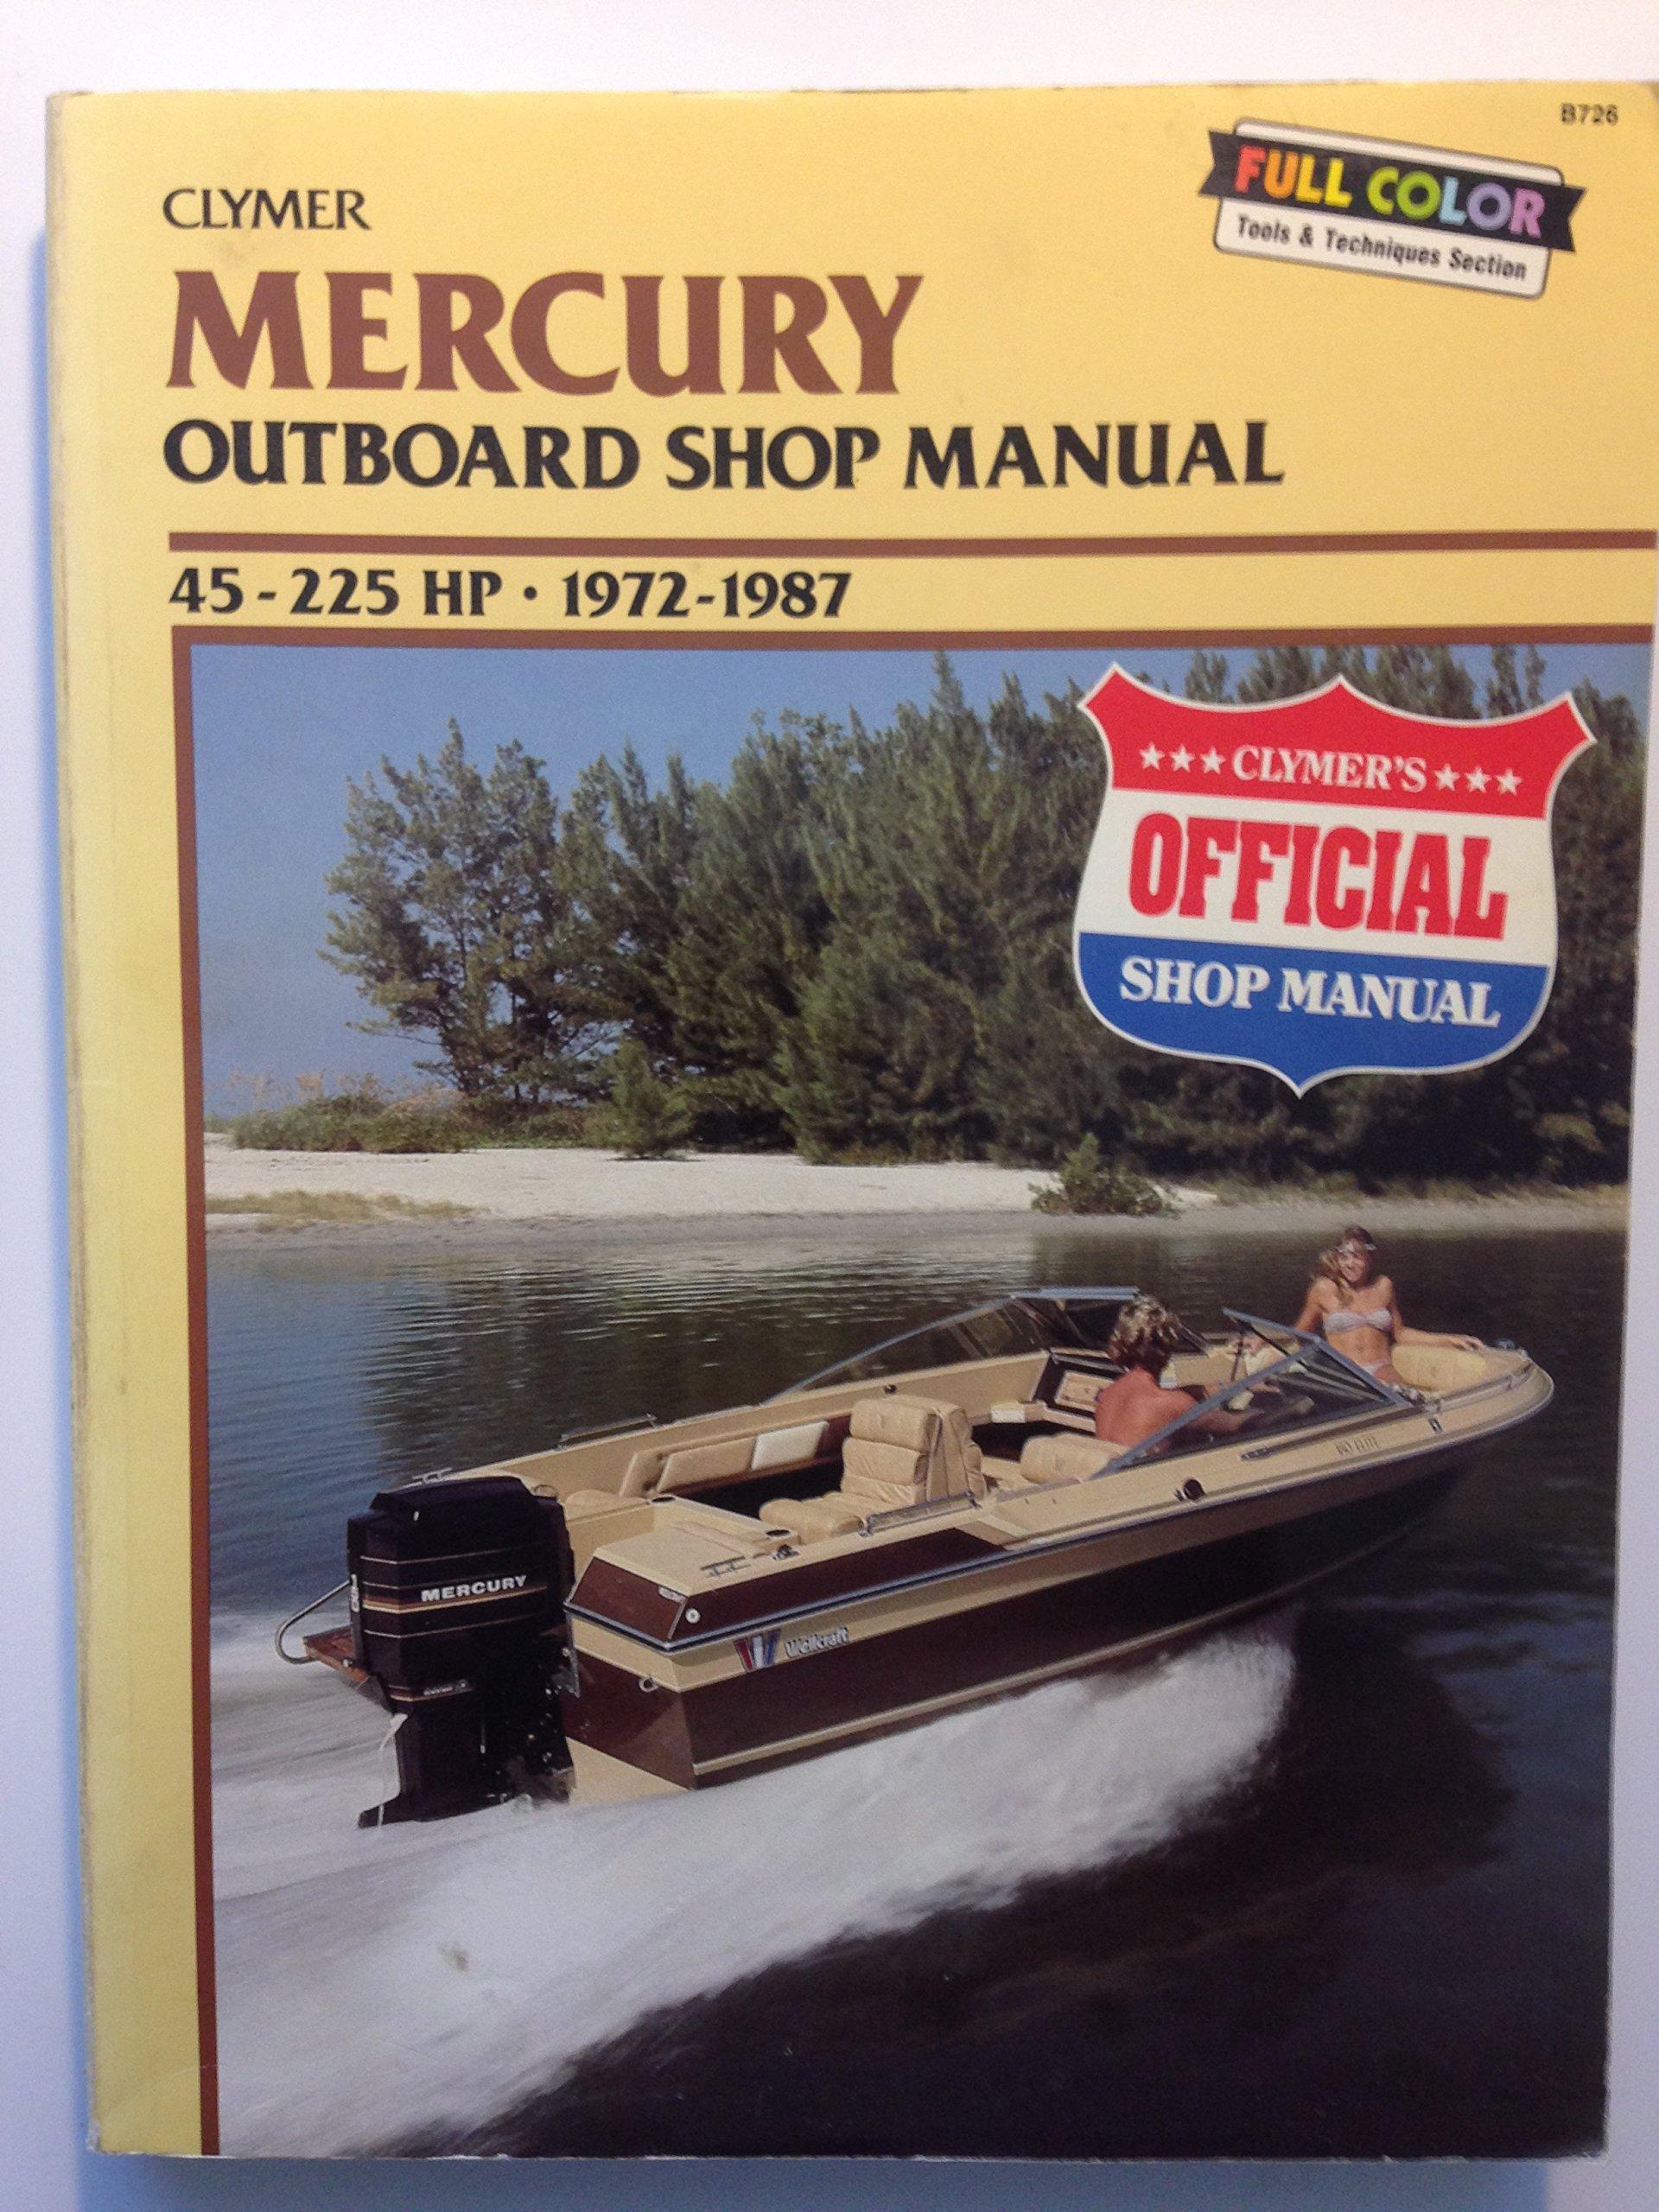 Mercury Outboard Shop Manual 45-225 hp 1972-1987: Kalton C